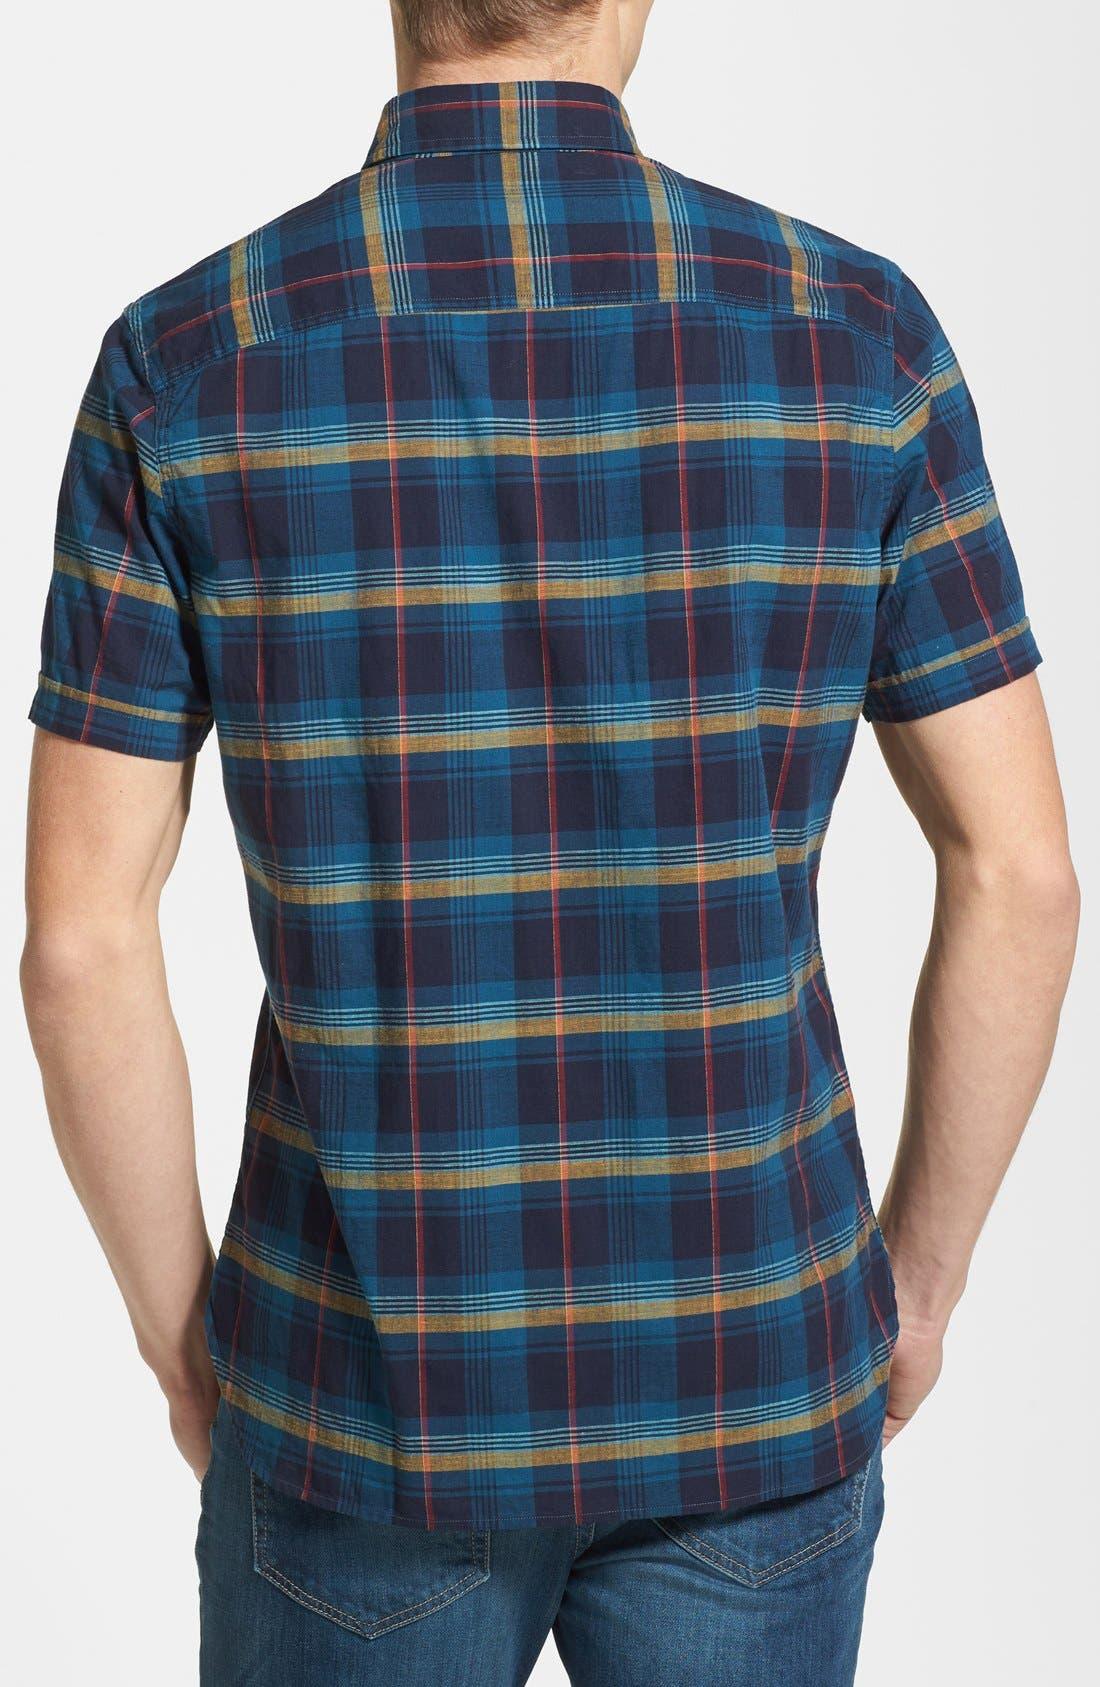 Alternate Image 2  - Wallin & Bros. 'Signature' Trim Fit Short Sleeve Madras Sport Shirt